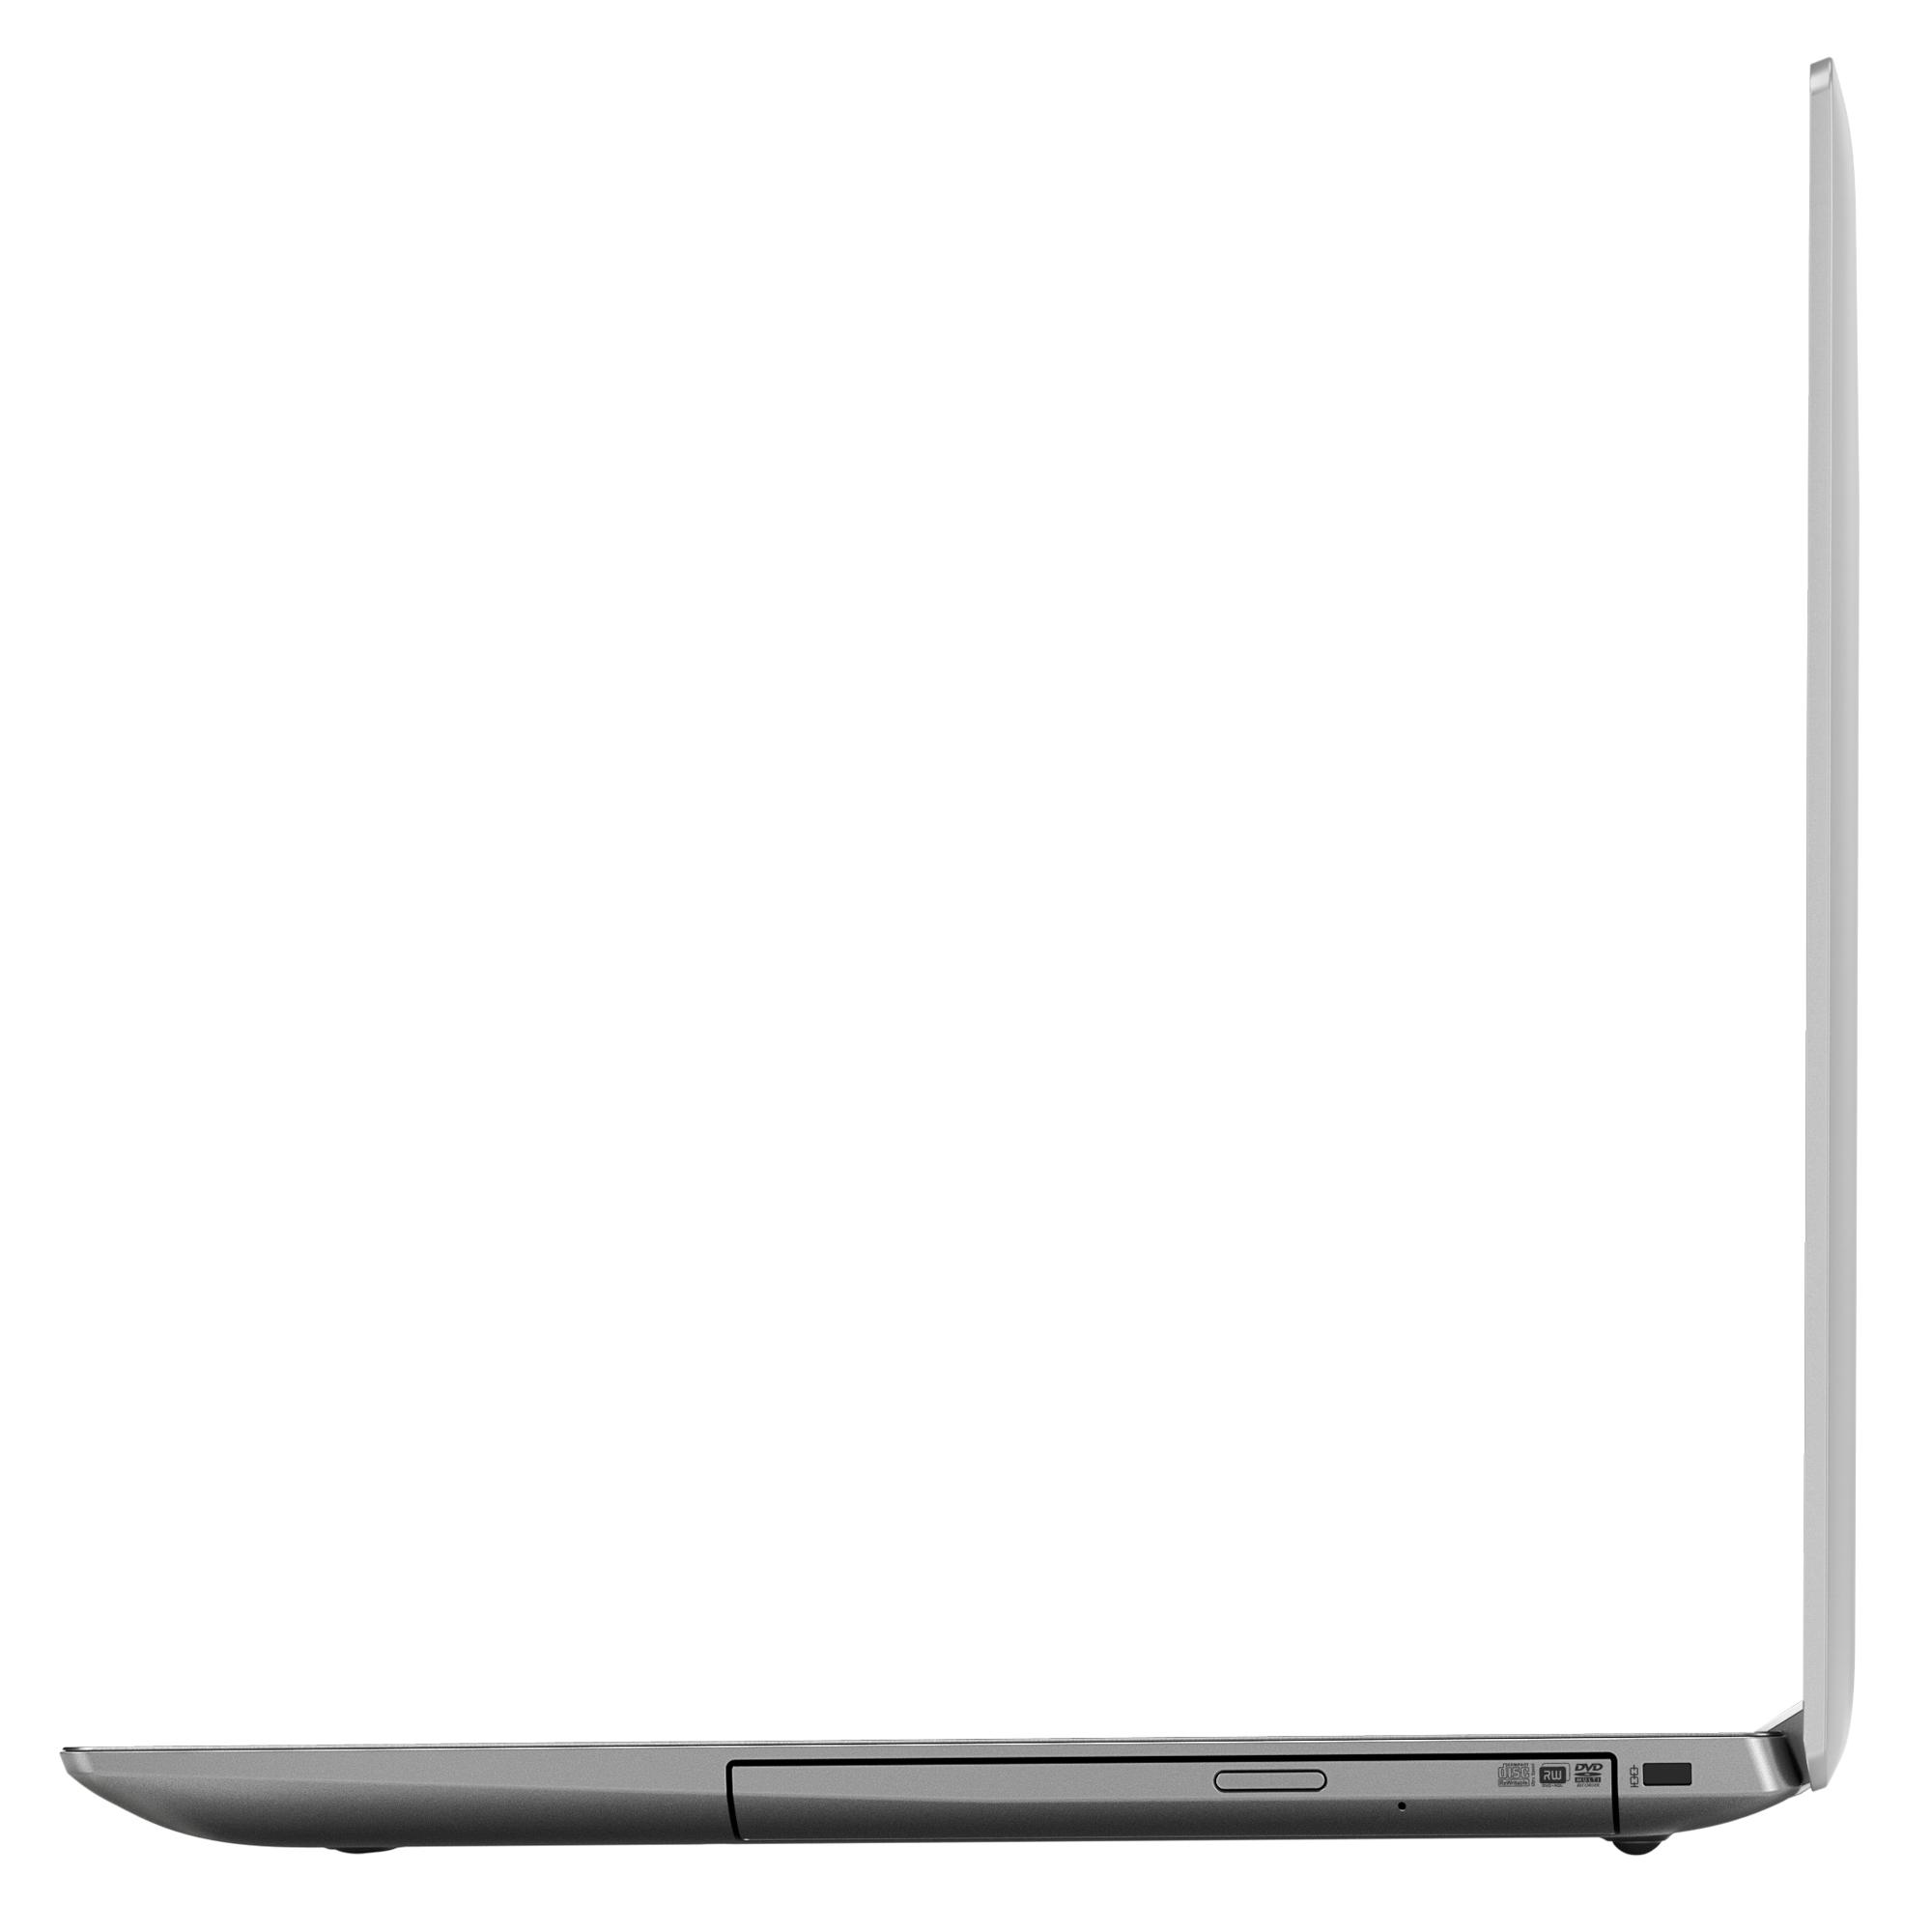 Фото  Ноутбук Lenovo ideapad 330-15 Platinum Grey (81DC00RTRA)